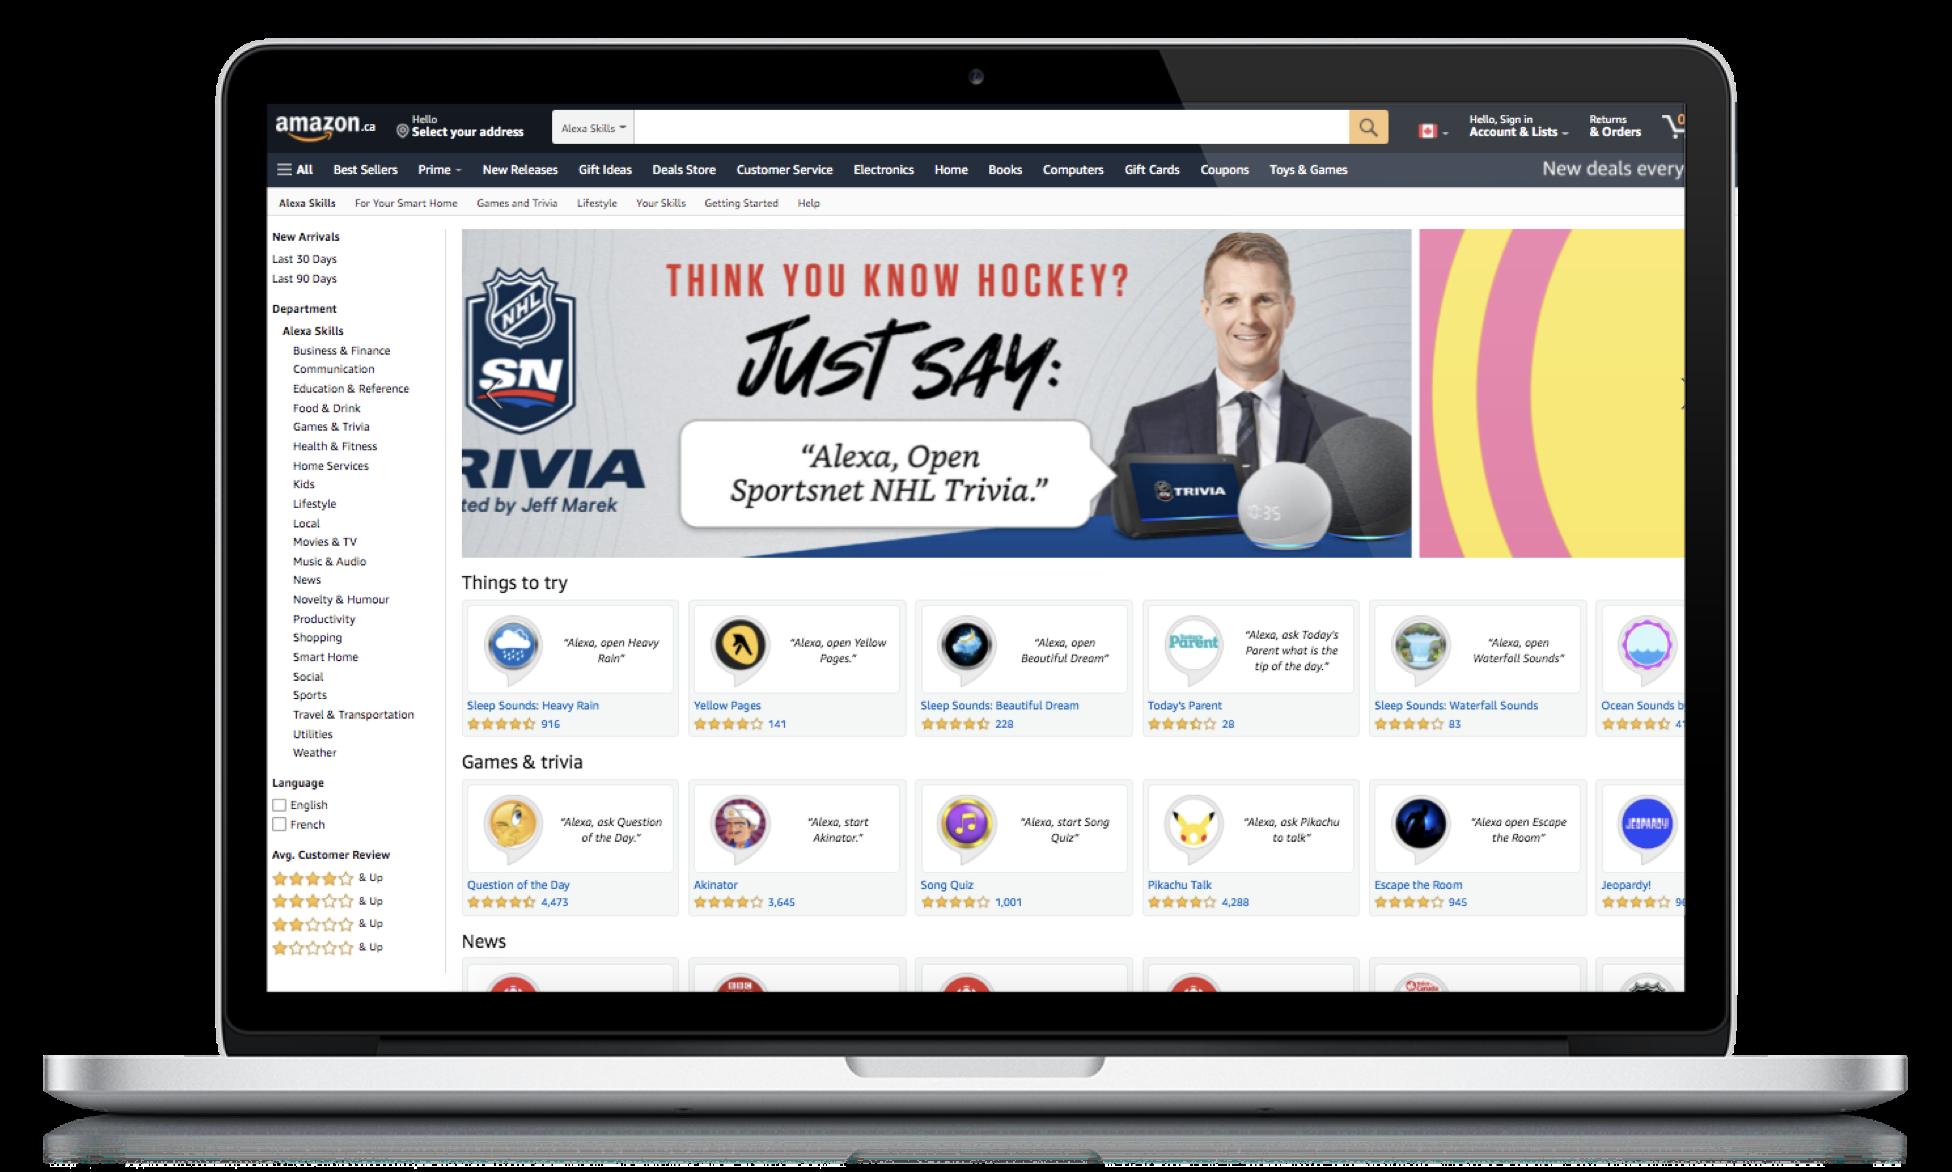 Amazon Skillstore Billboard Promotional Campaign